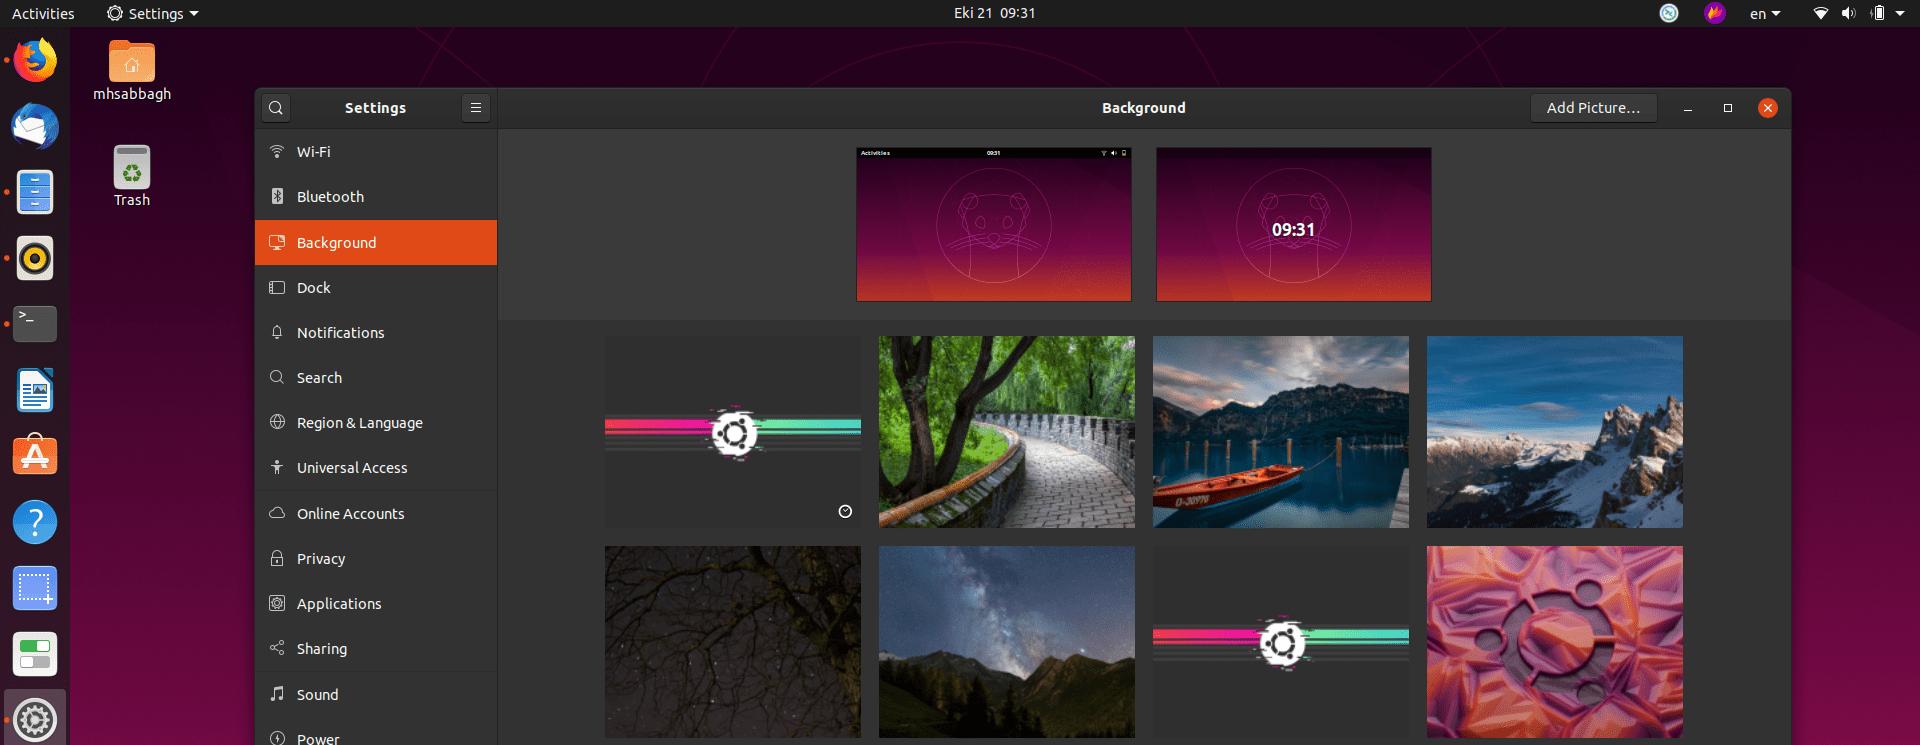 85 Ubuntu 19.10